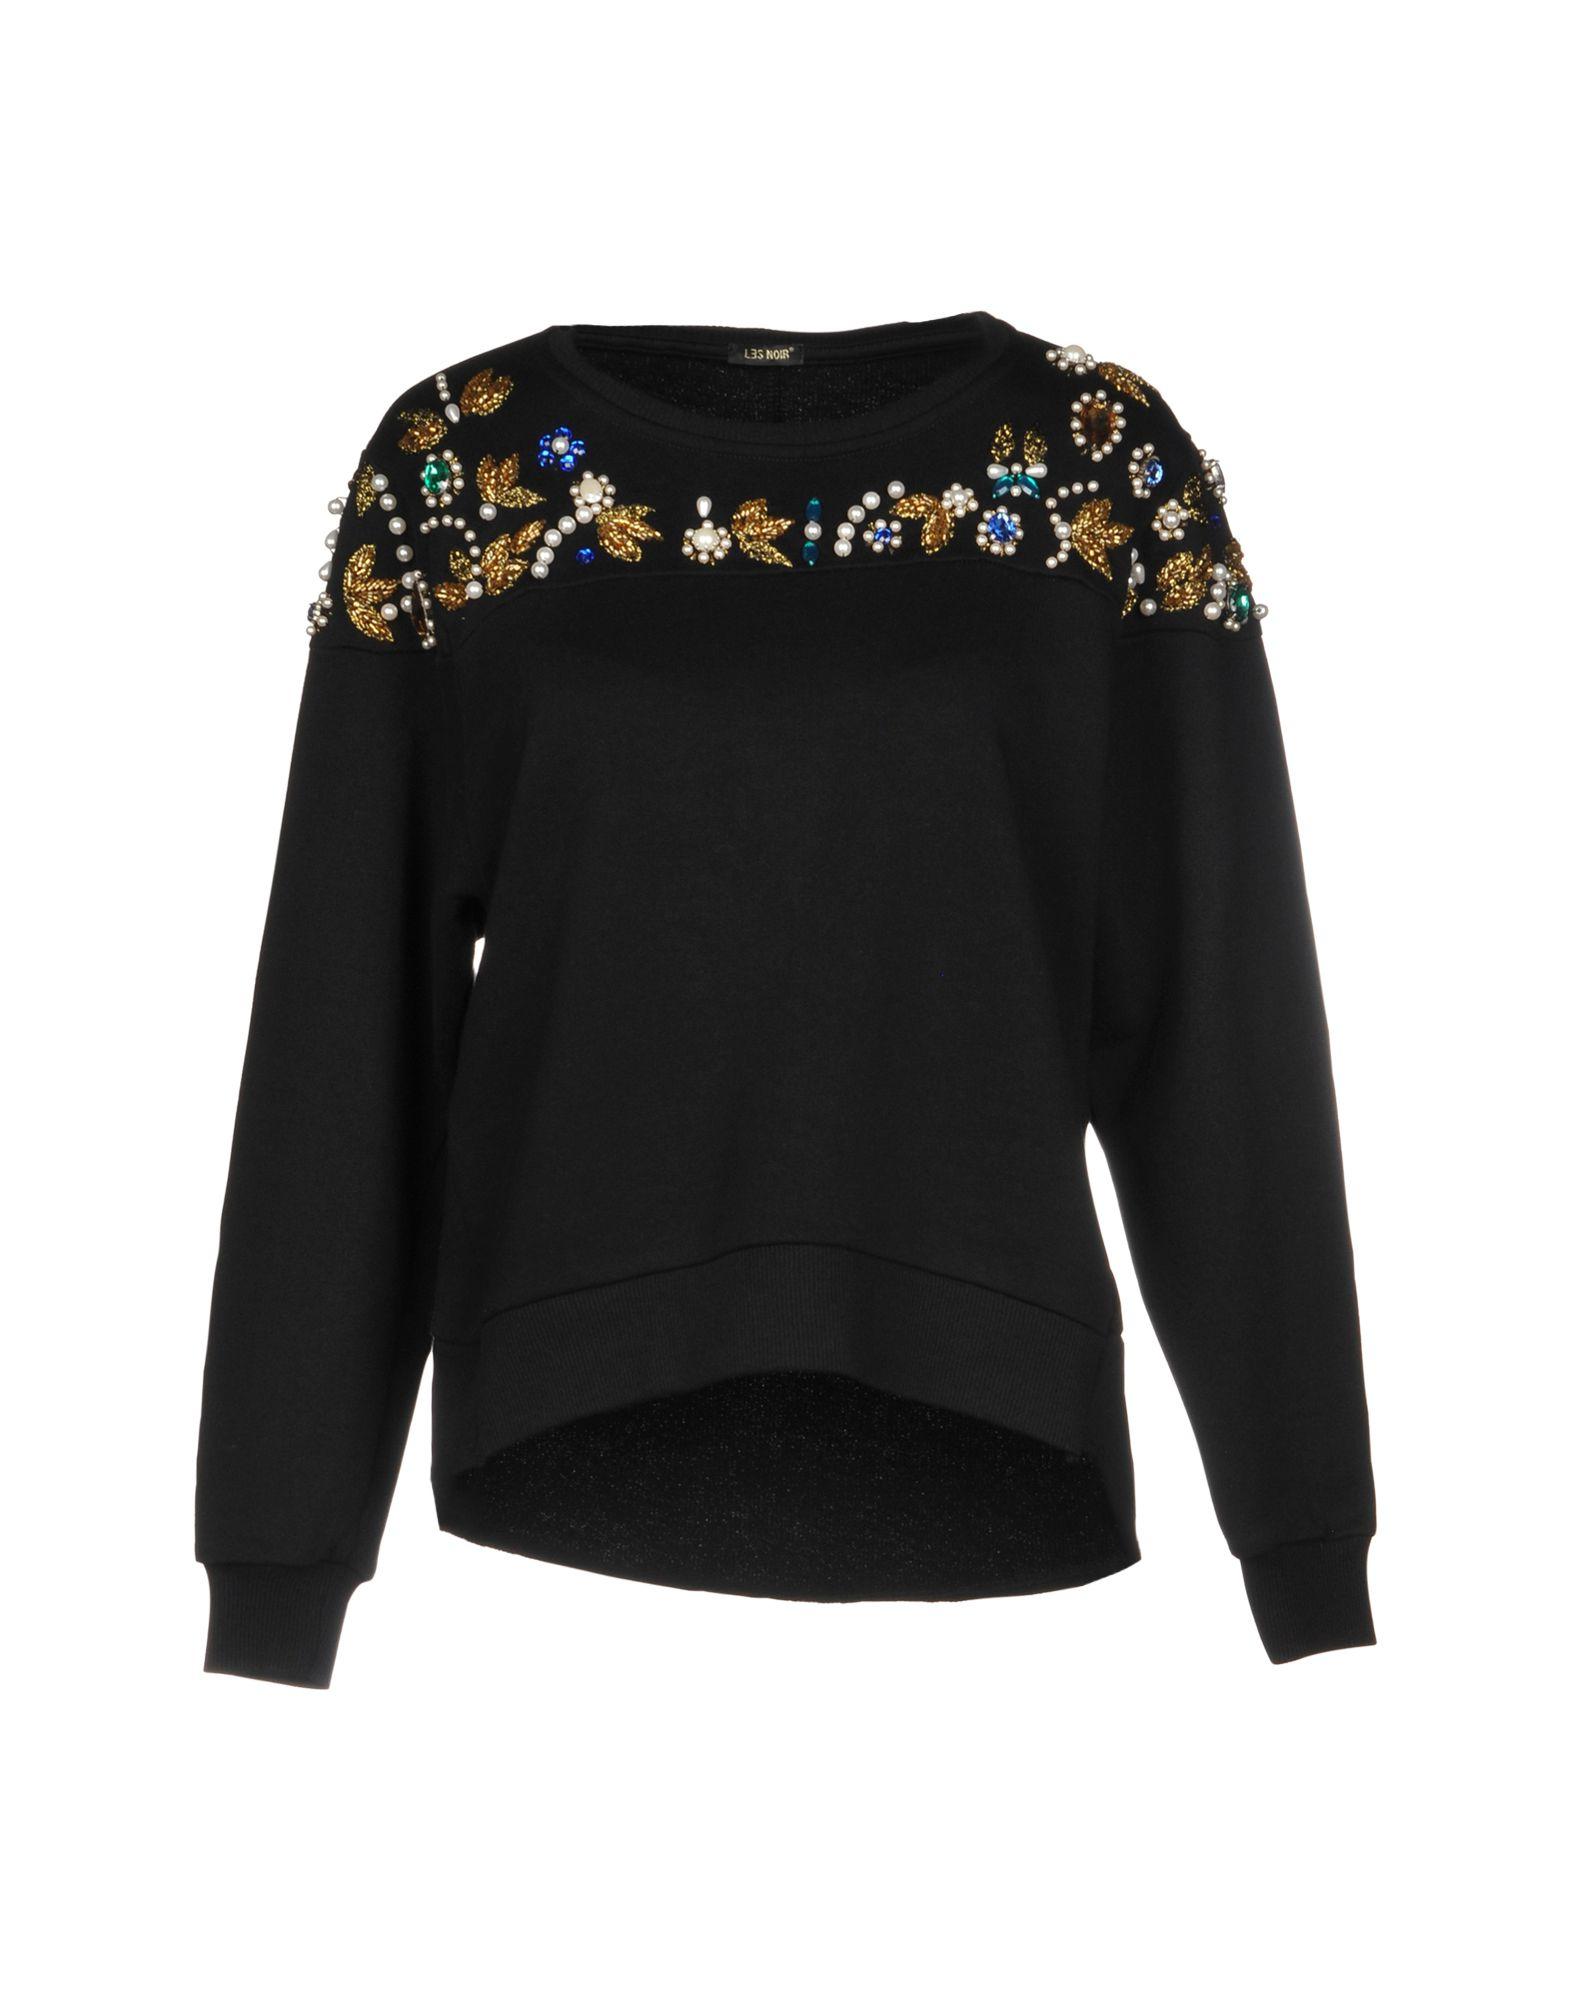 LES NOIR Толстовка футболка supremebeing pantera noir ss14 black 8901 xl